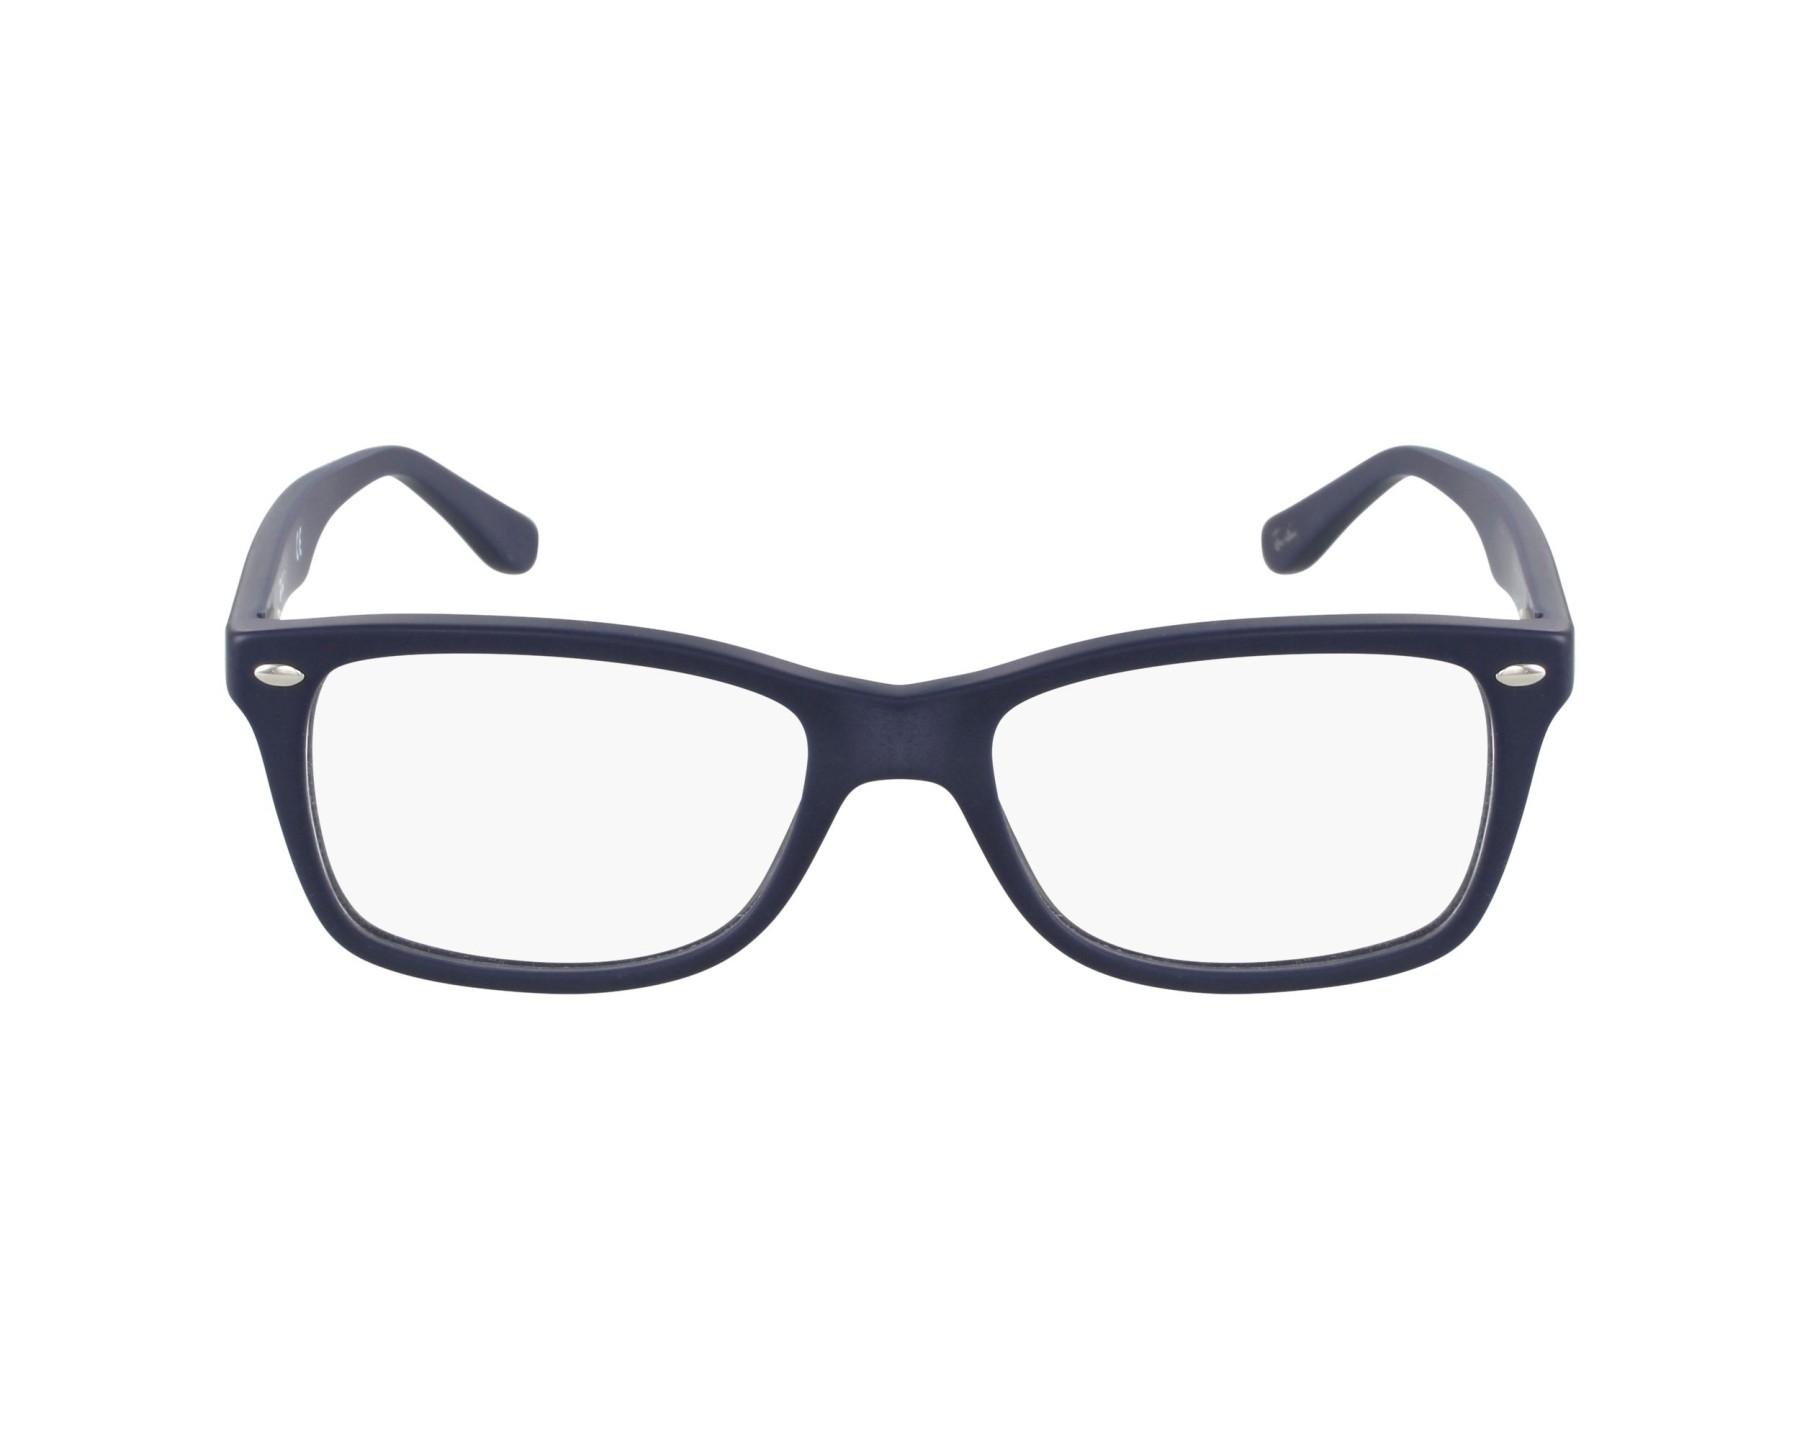 f37450d90 Brillen Ray-Ban RX-5228 5583 50-17 blau Profilansicht